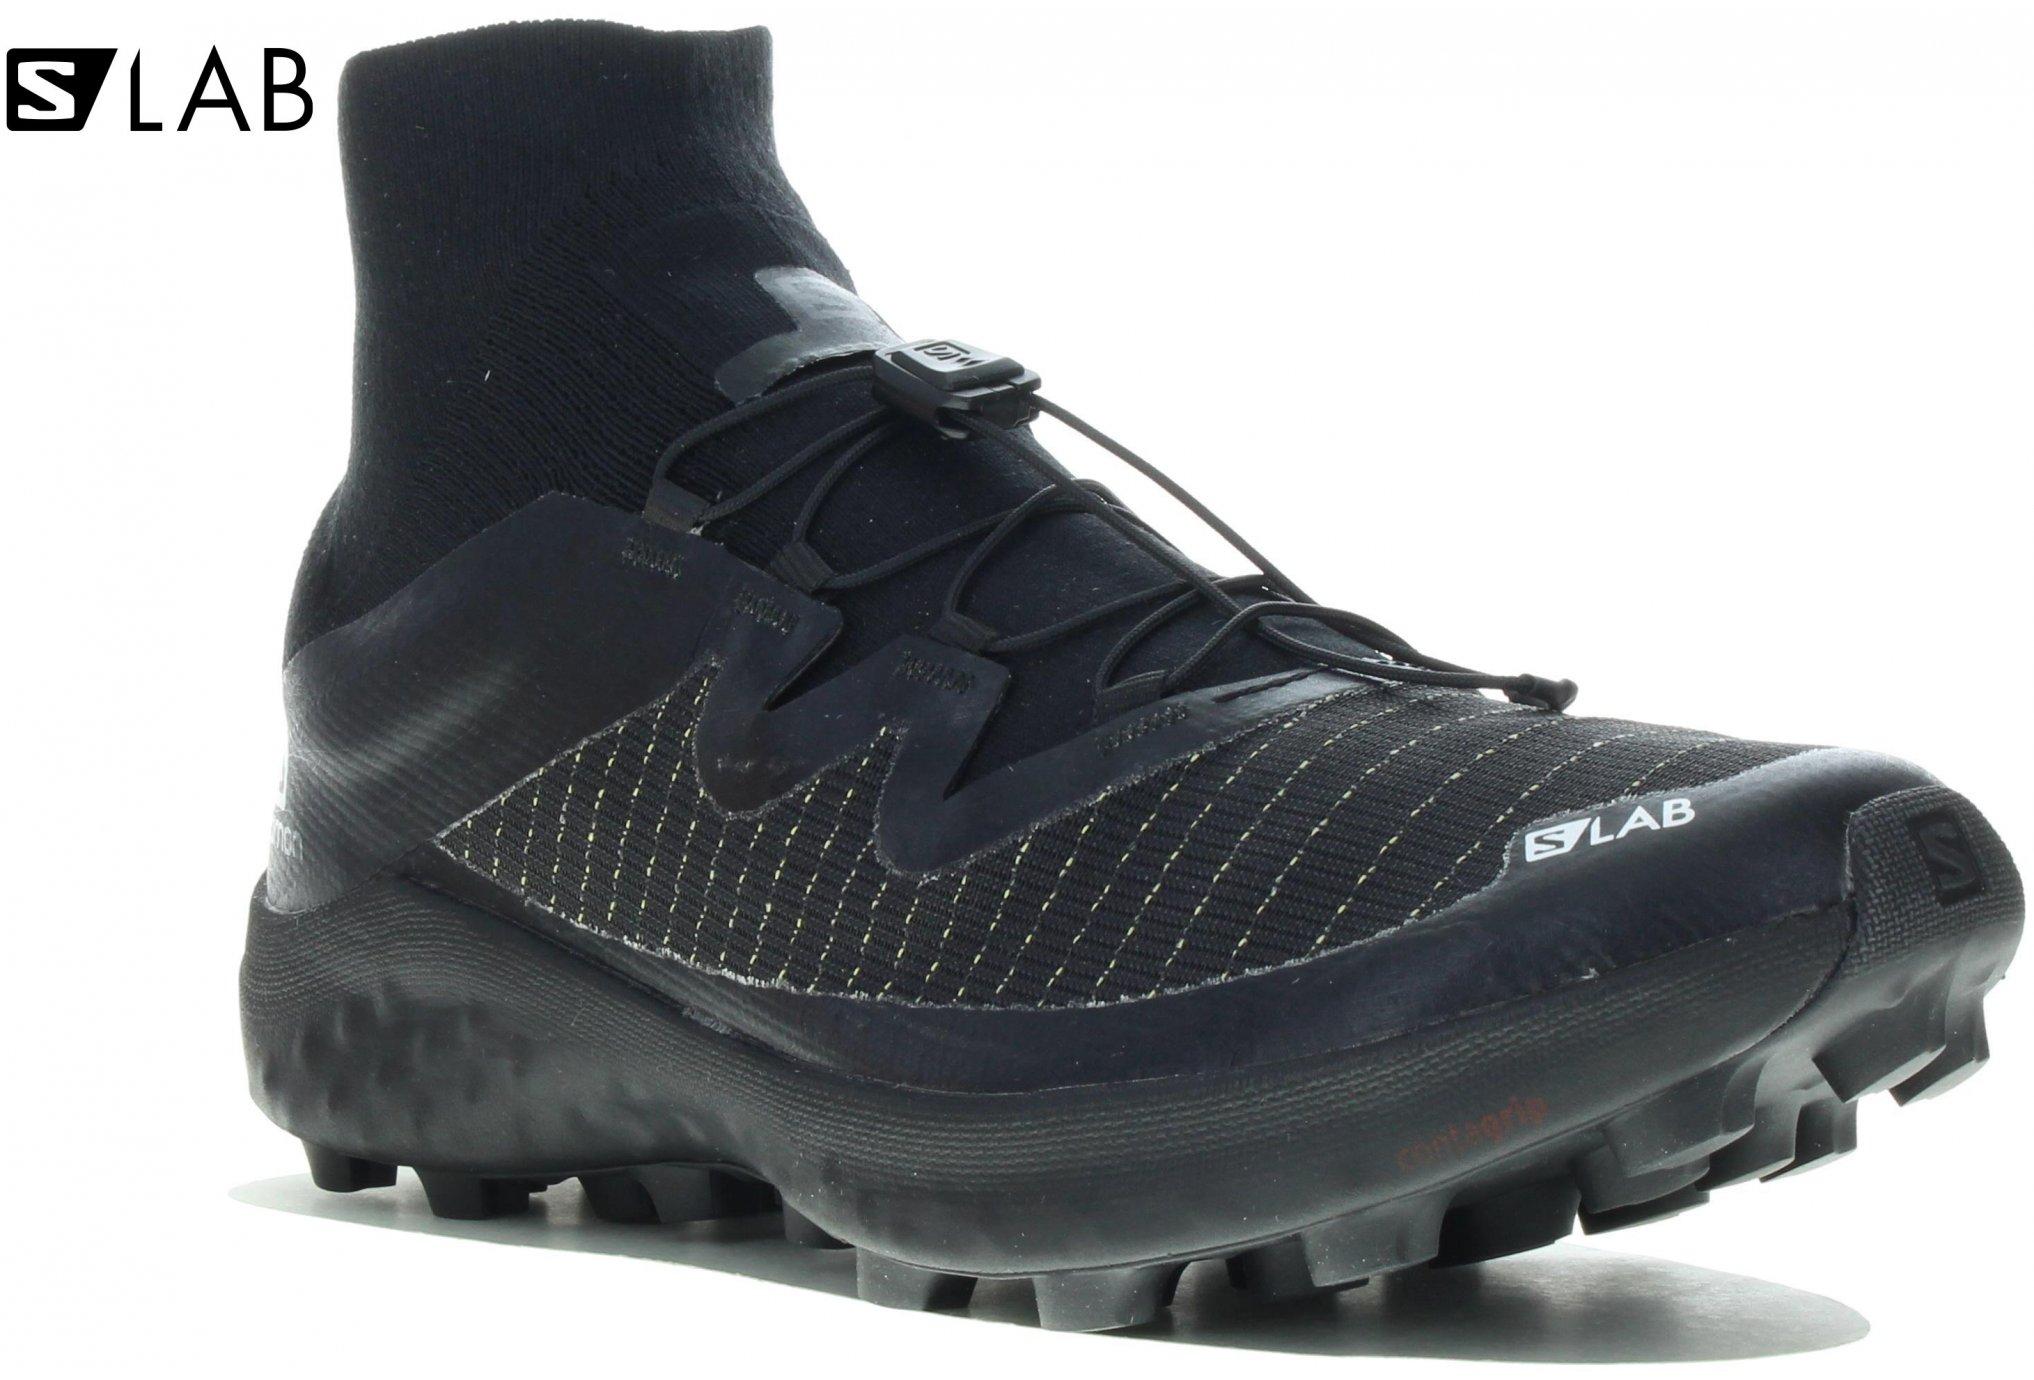 Salomon S/Lab Cross W Chaussures running femme